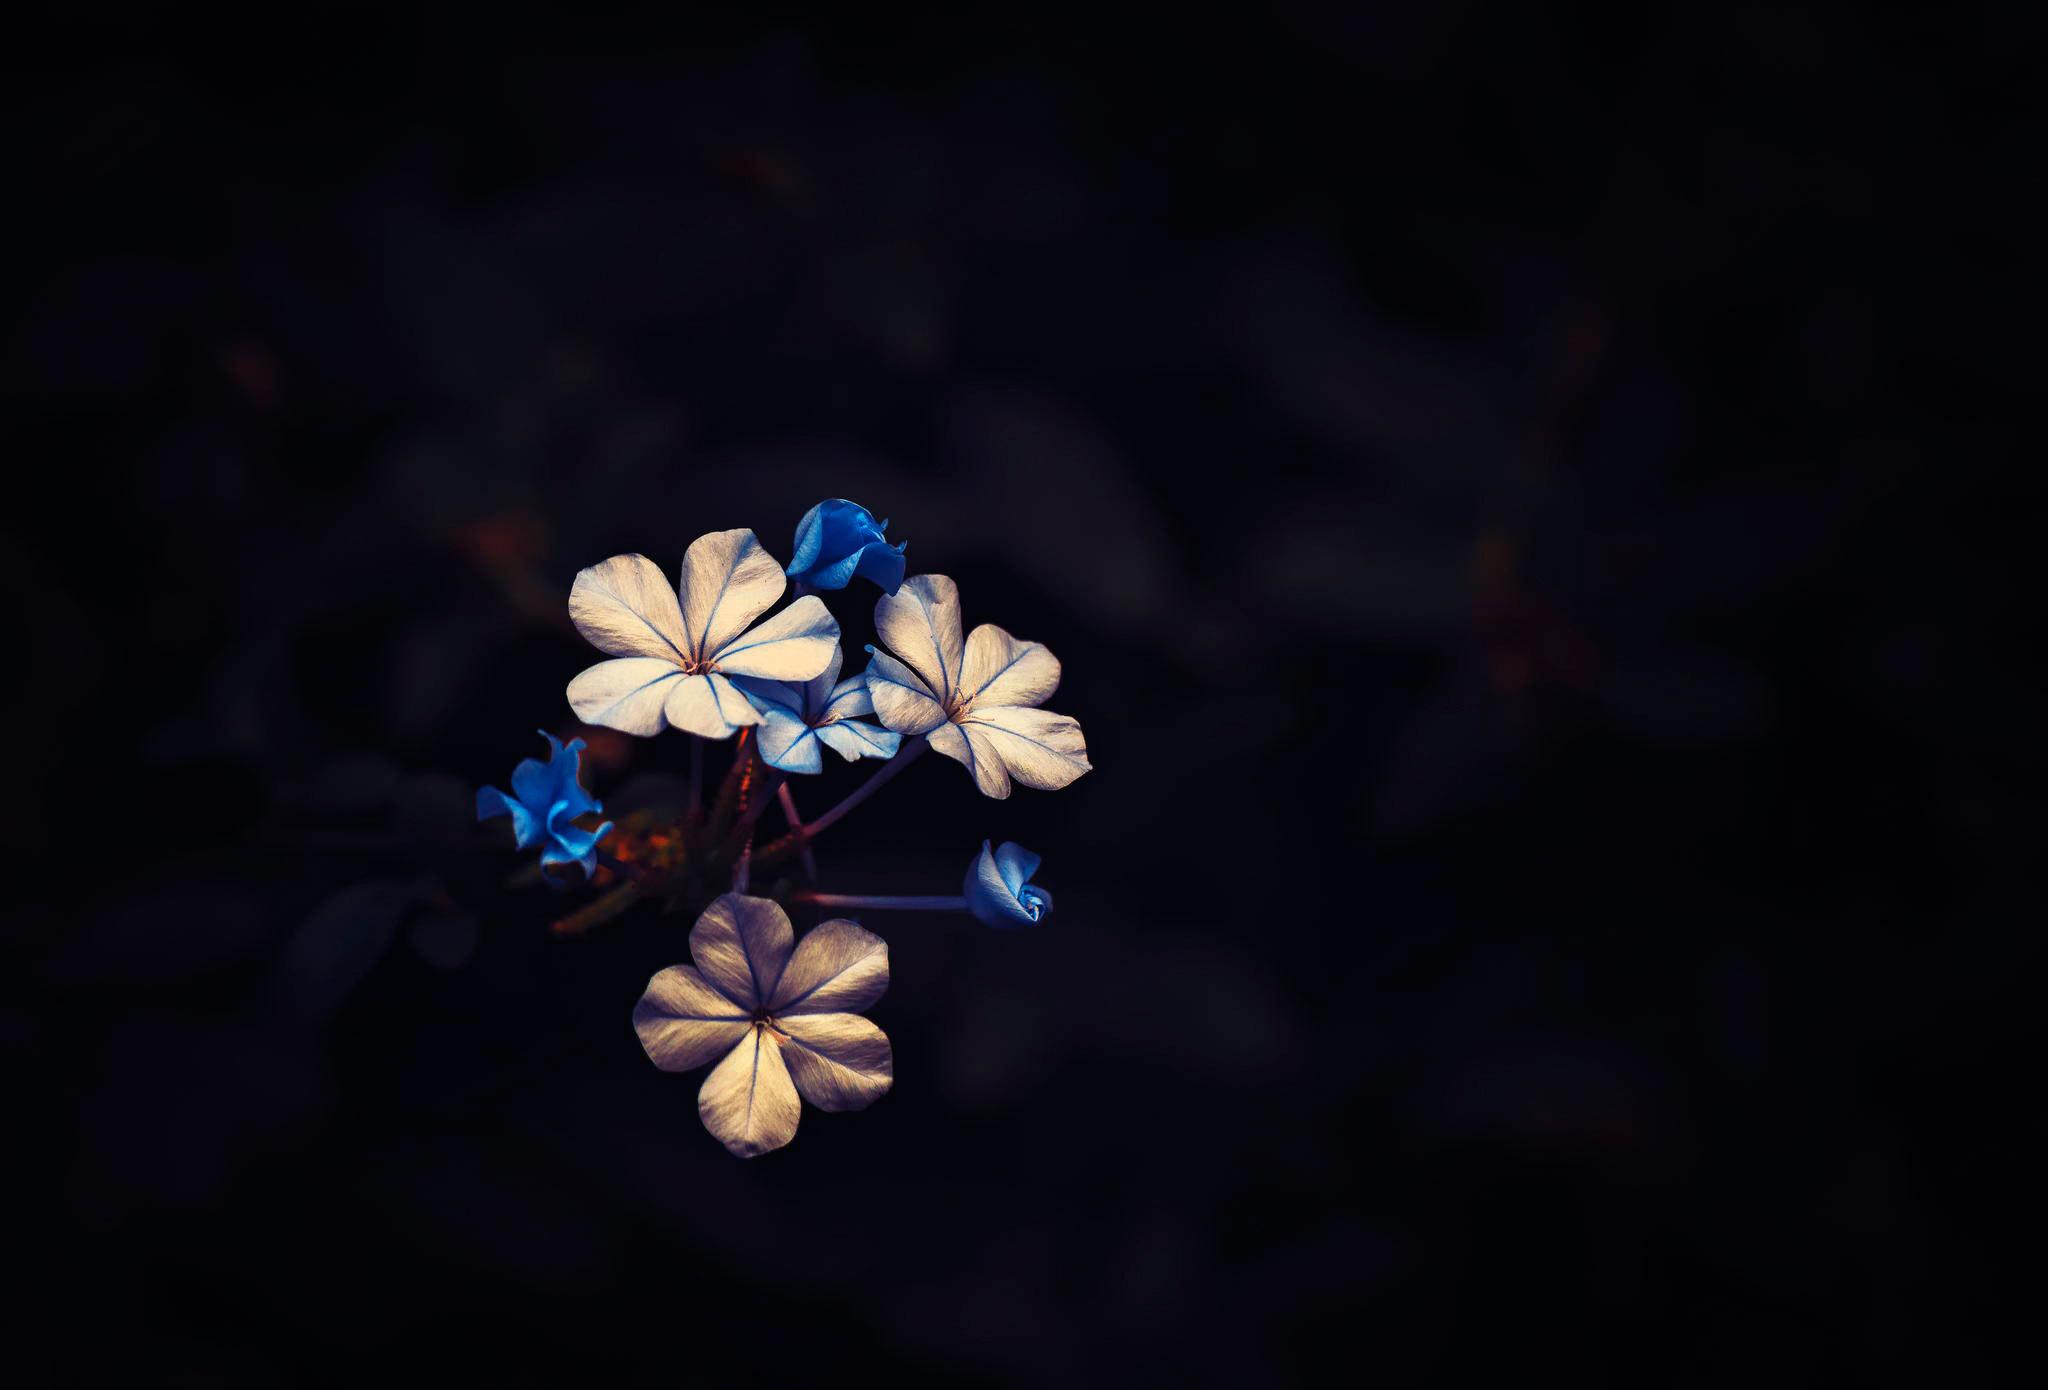 Dark flower wallpaper wallpapersafari - Flower wallpaper black ...